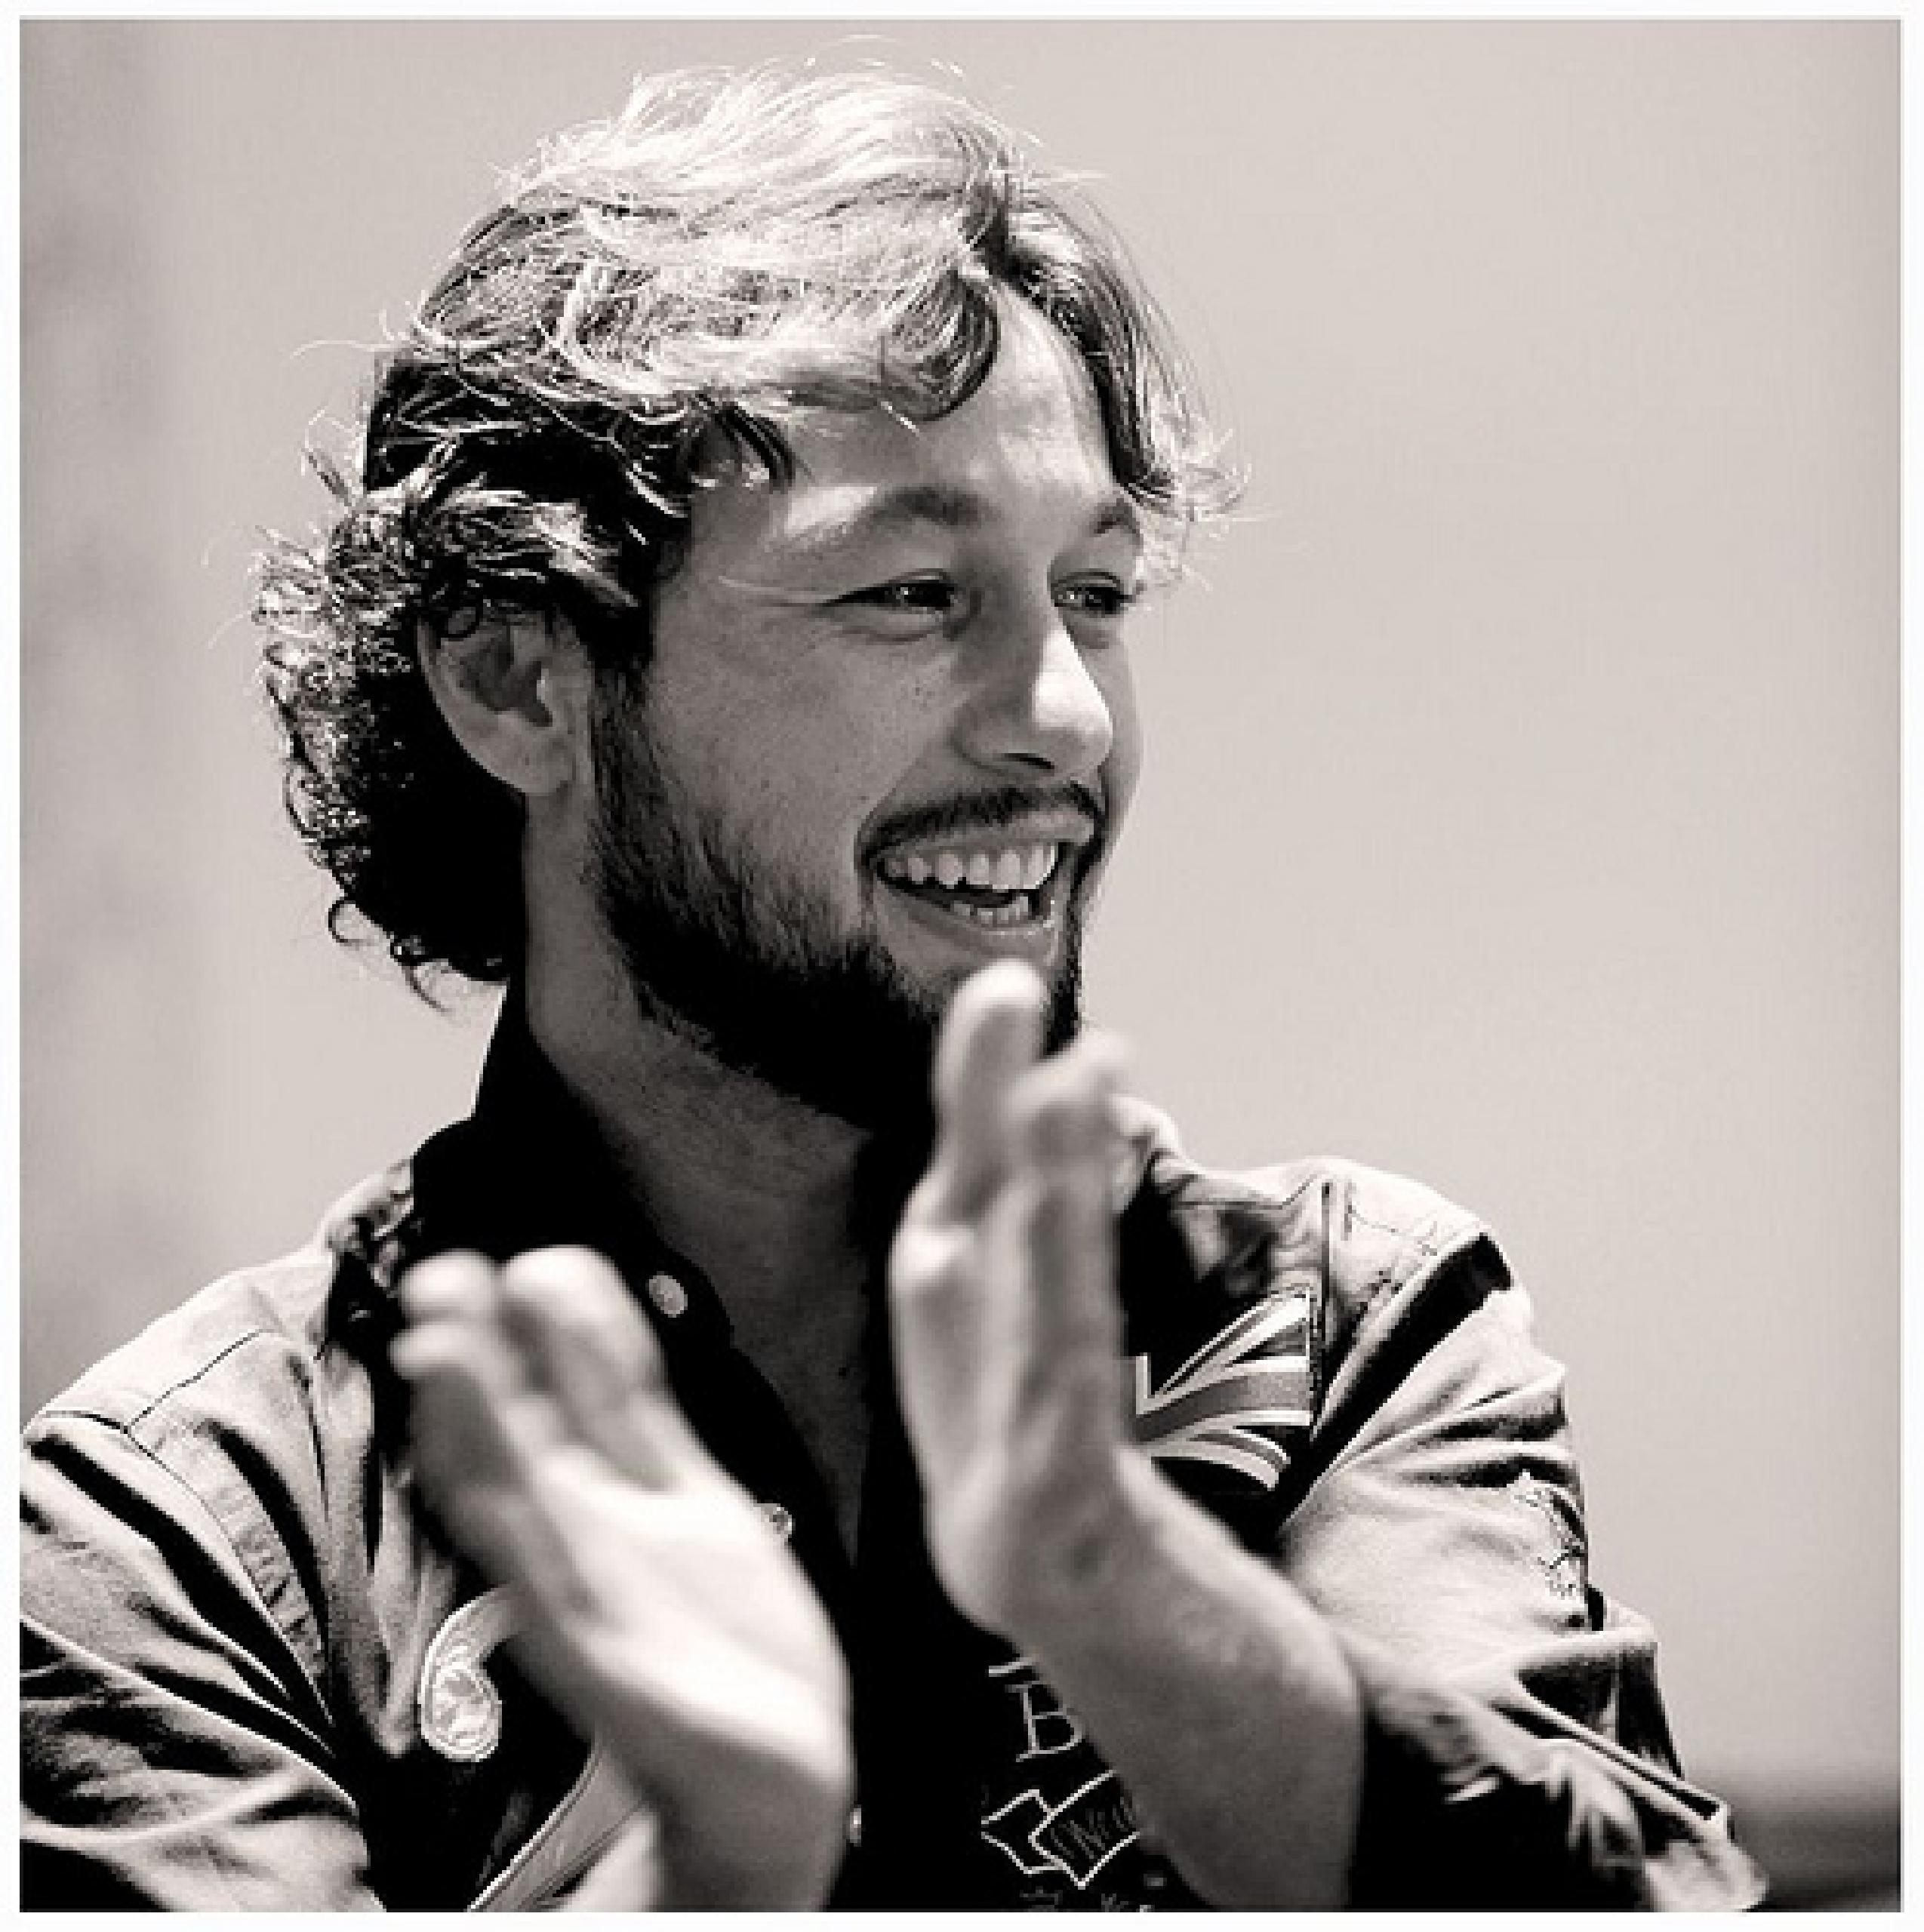 Miguel Lavi